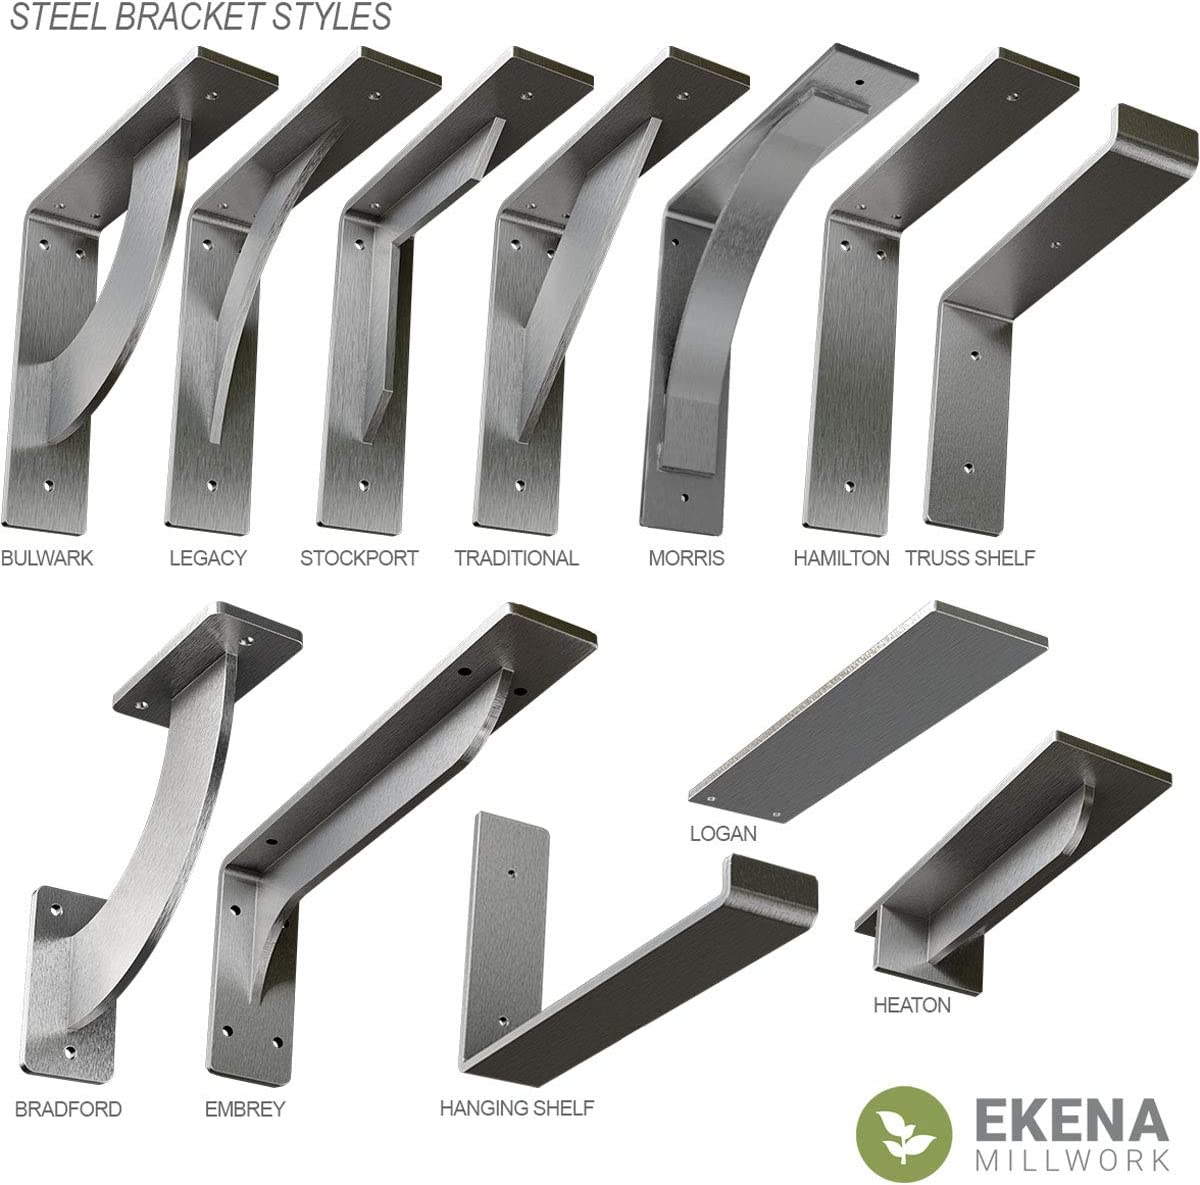 Hammered Brown Ekena Millwork BKTM02X07X07BRHBR 2 inch W x 7 inch D x 7 inch H Bradford steel Bracket